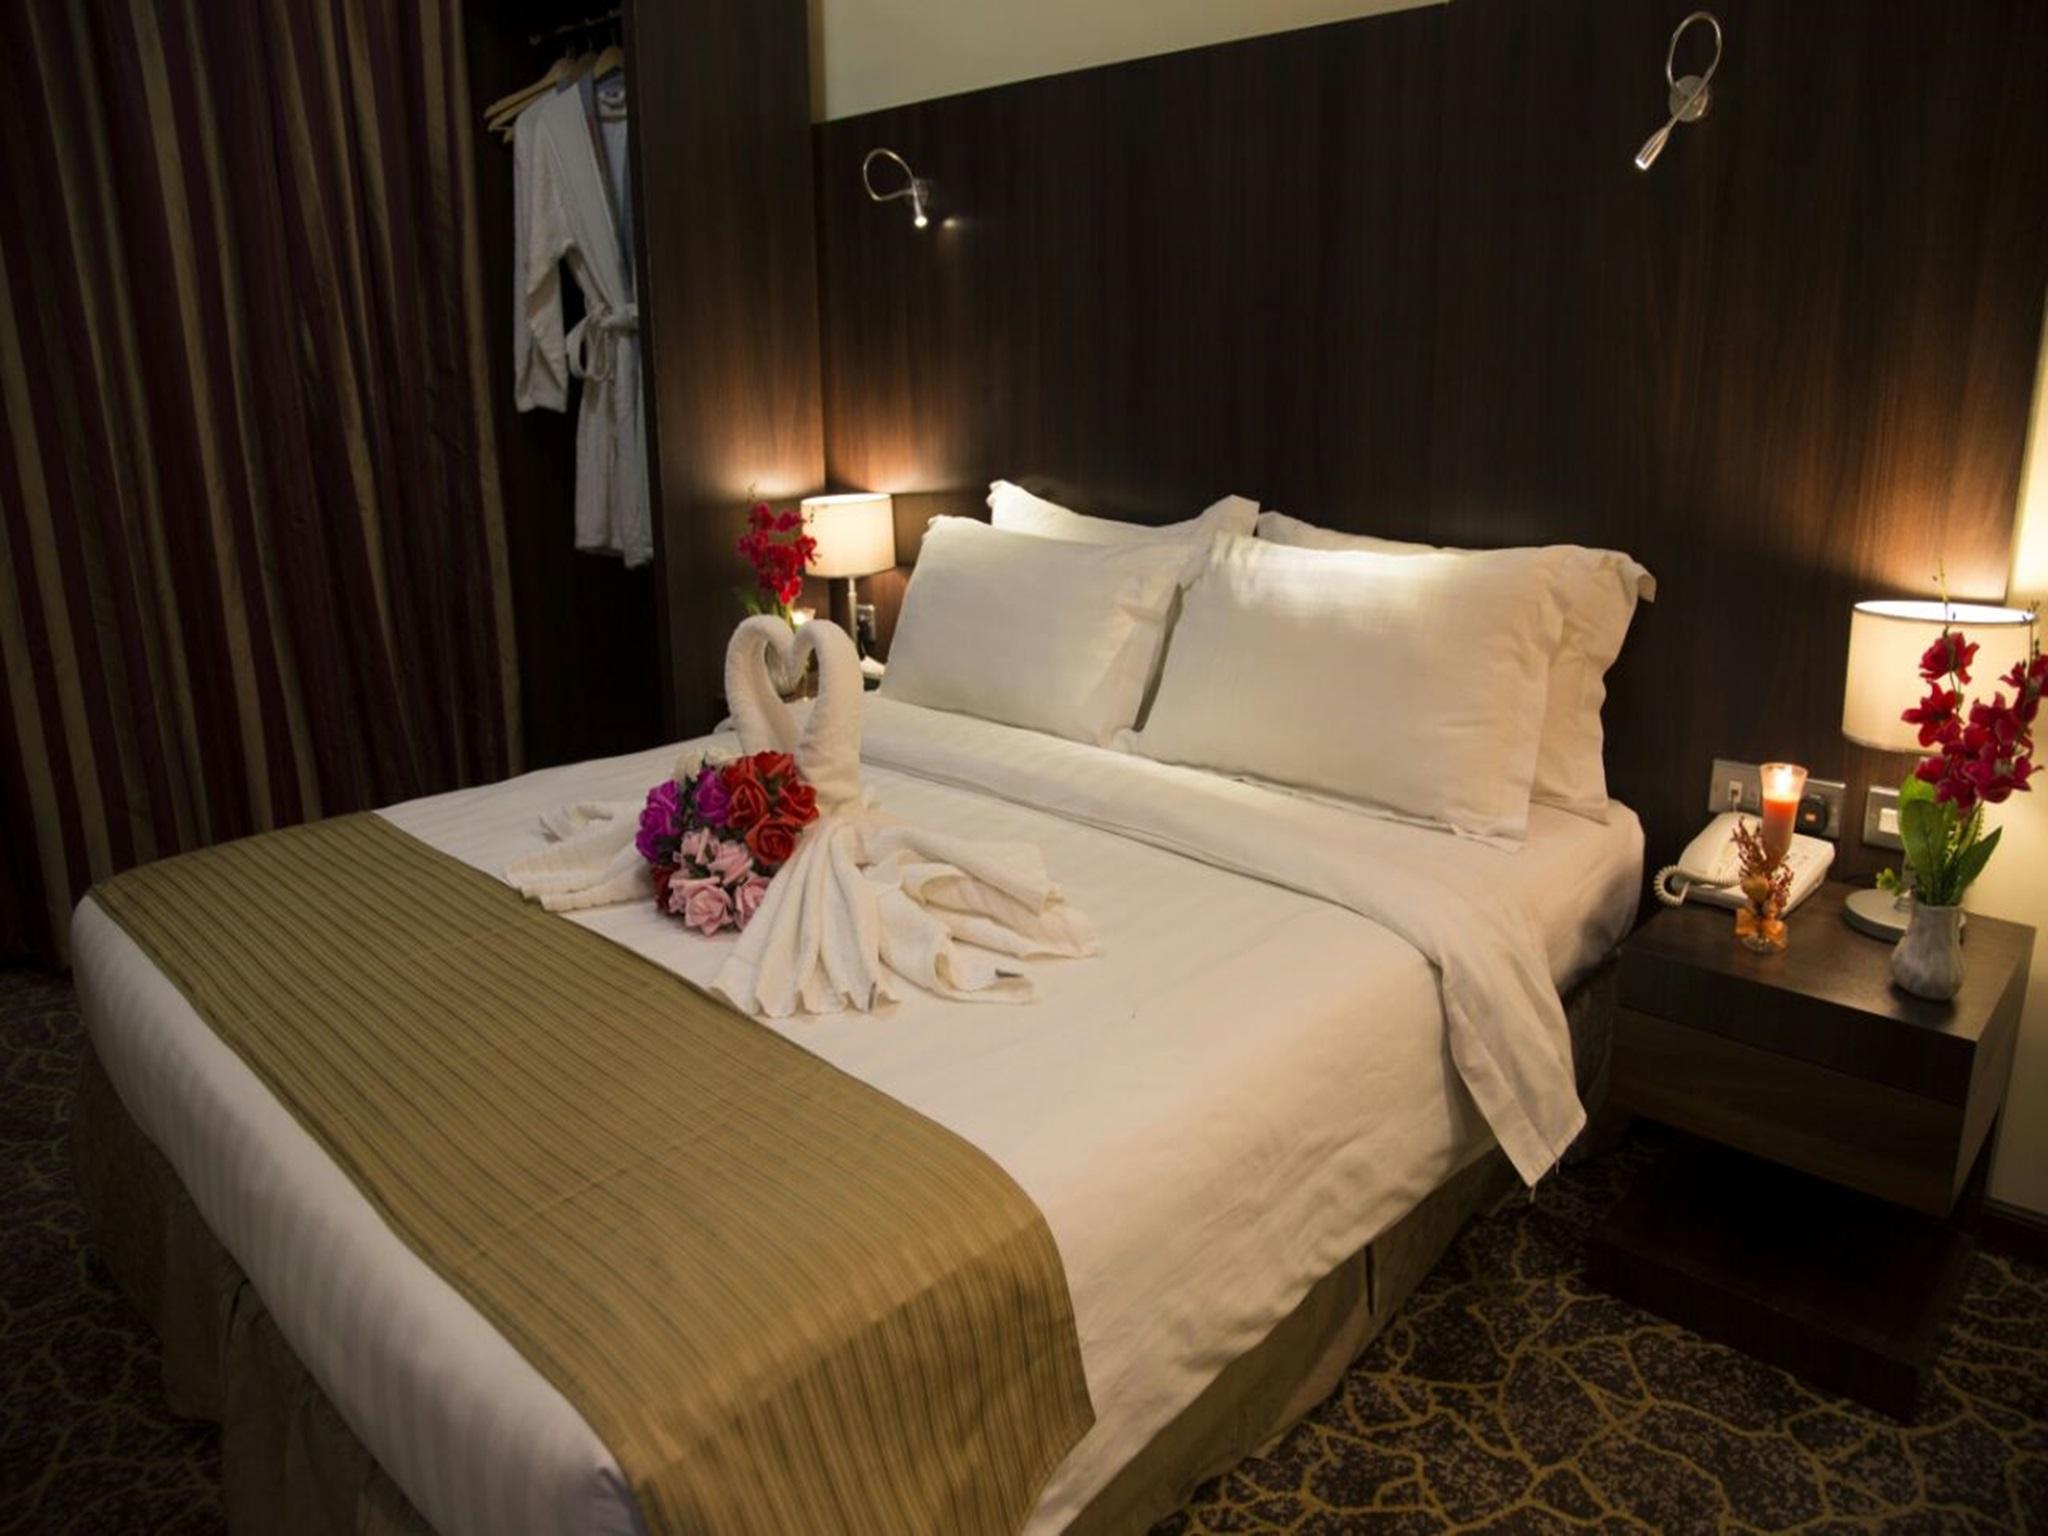 Sunrise hotel - room photo 14572985